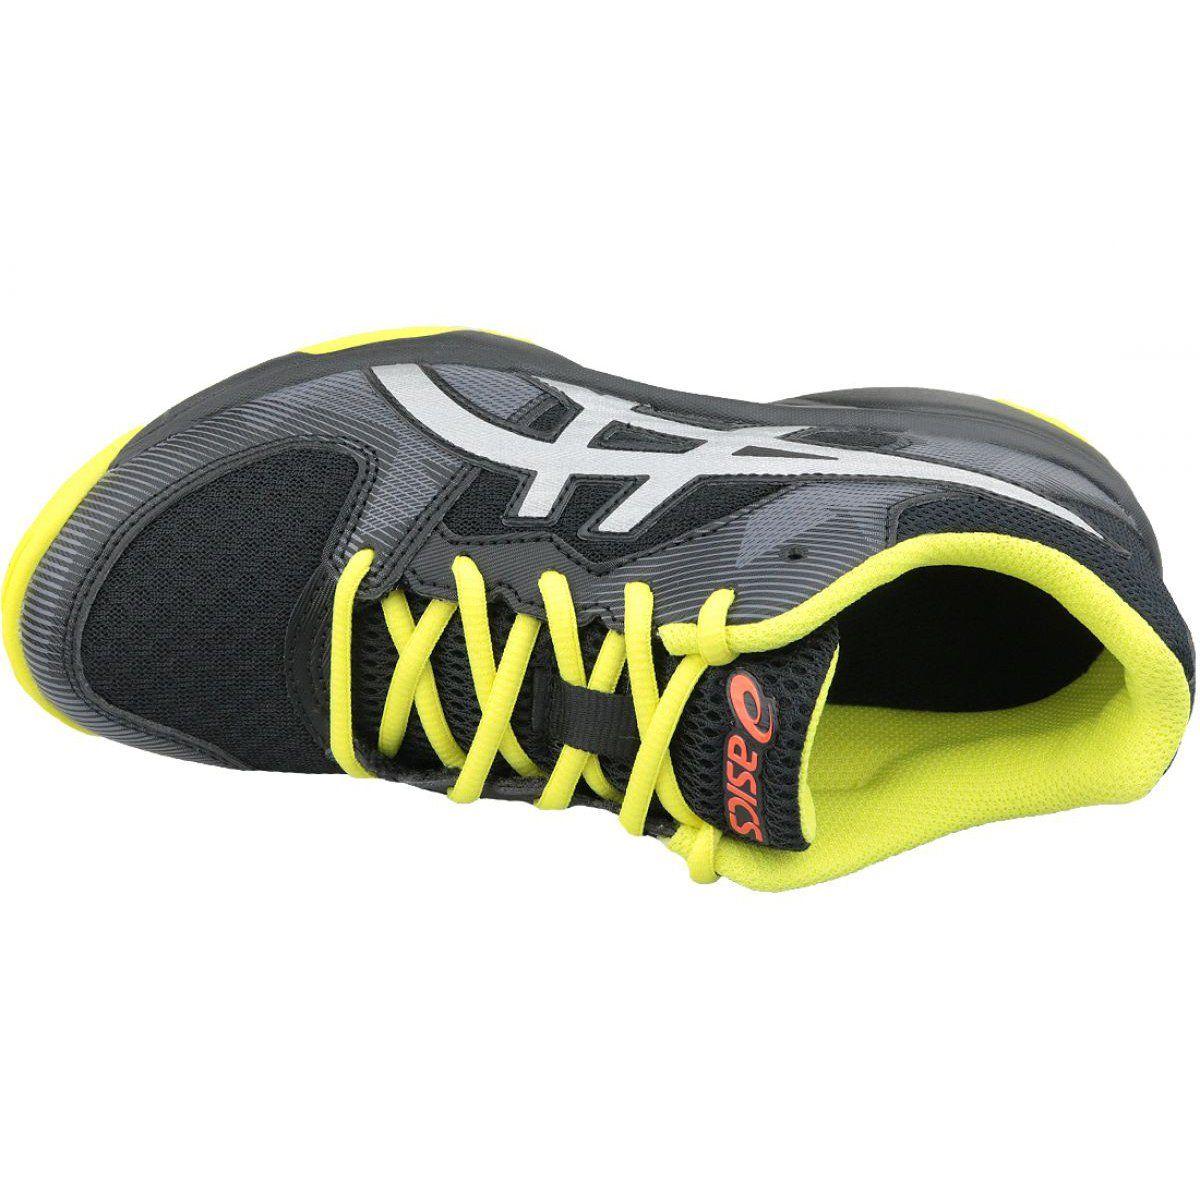 Buty Do Siatkowki Asics Gel Tactic Gs Jr 1074a014 001 Czarne Czarne Volleyball Shoes Asics Asics Gel